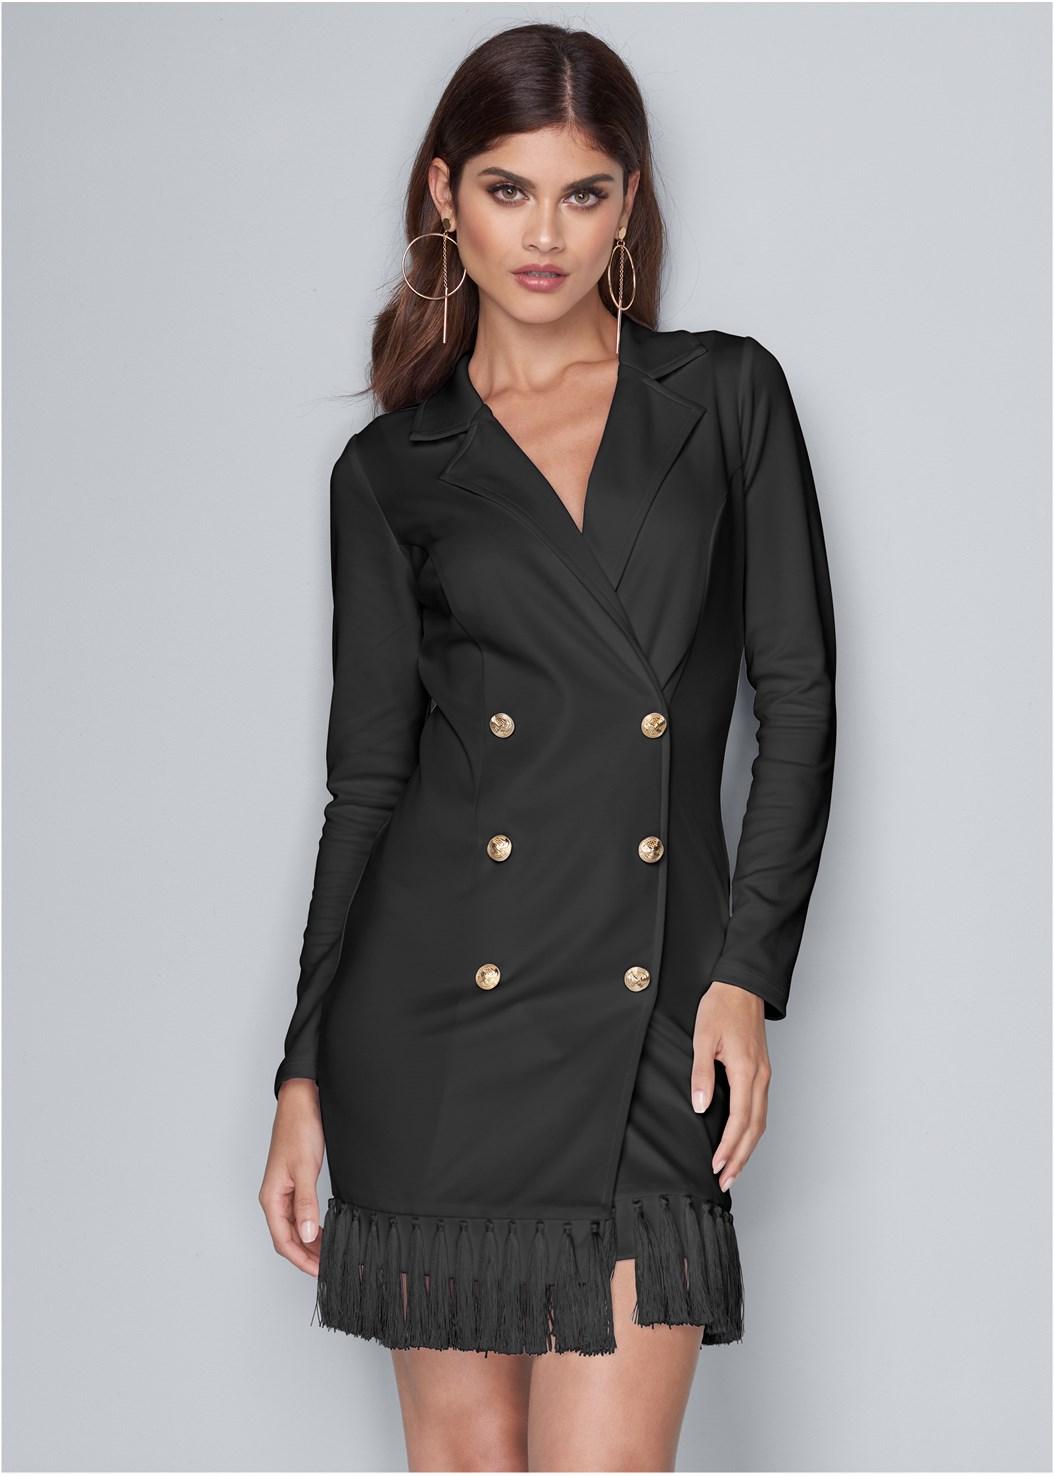 Tassel Coat Dress,Confidence Shaping Romper,Embellished Lucite Heel